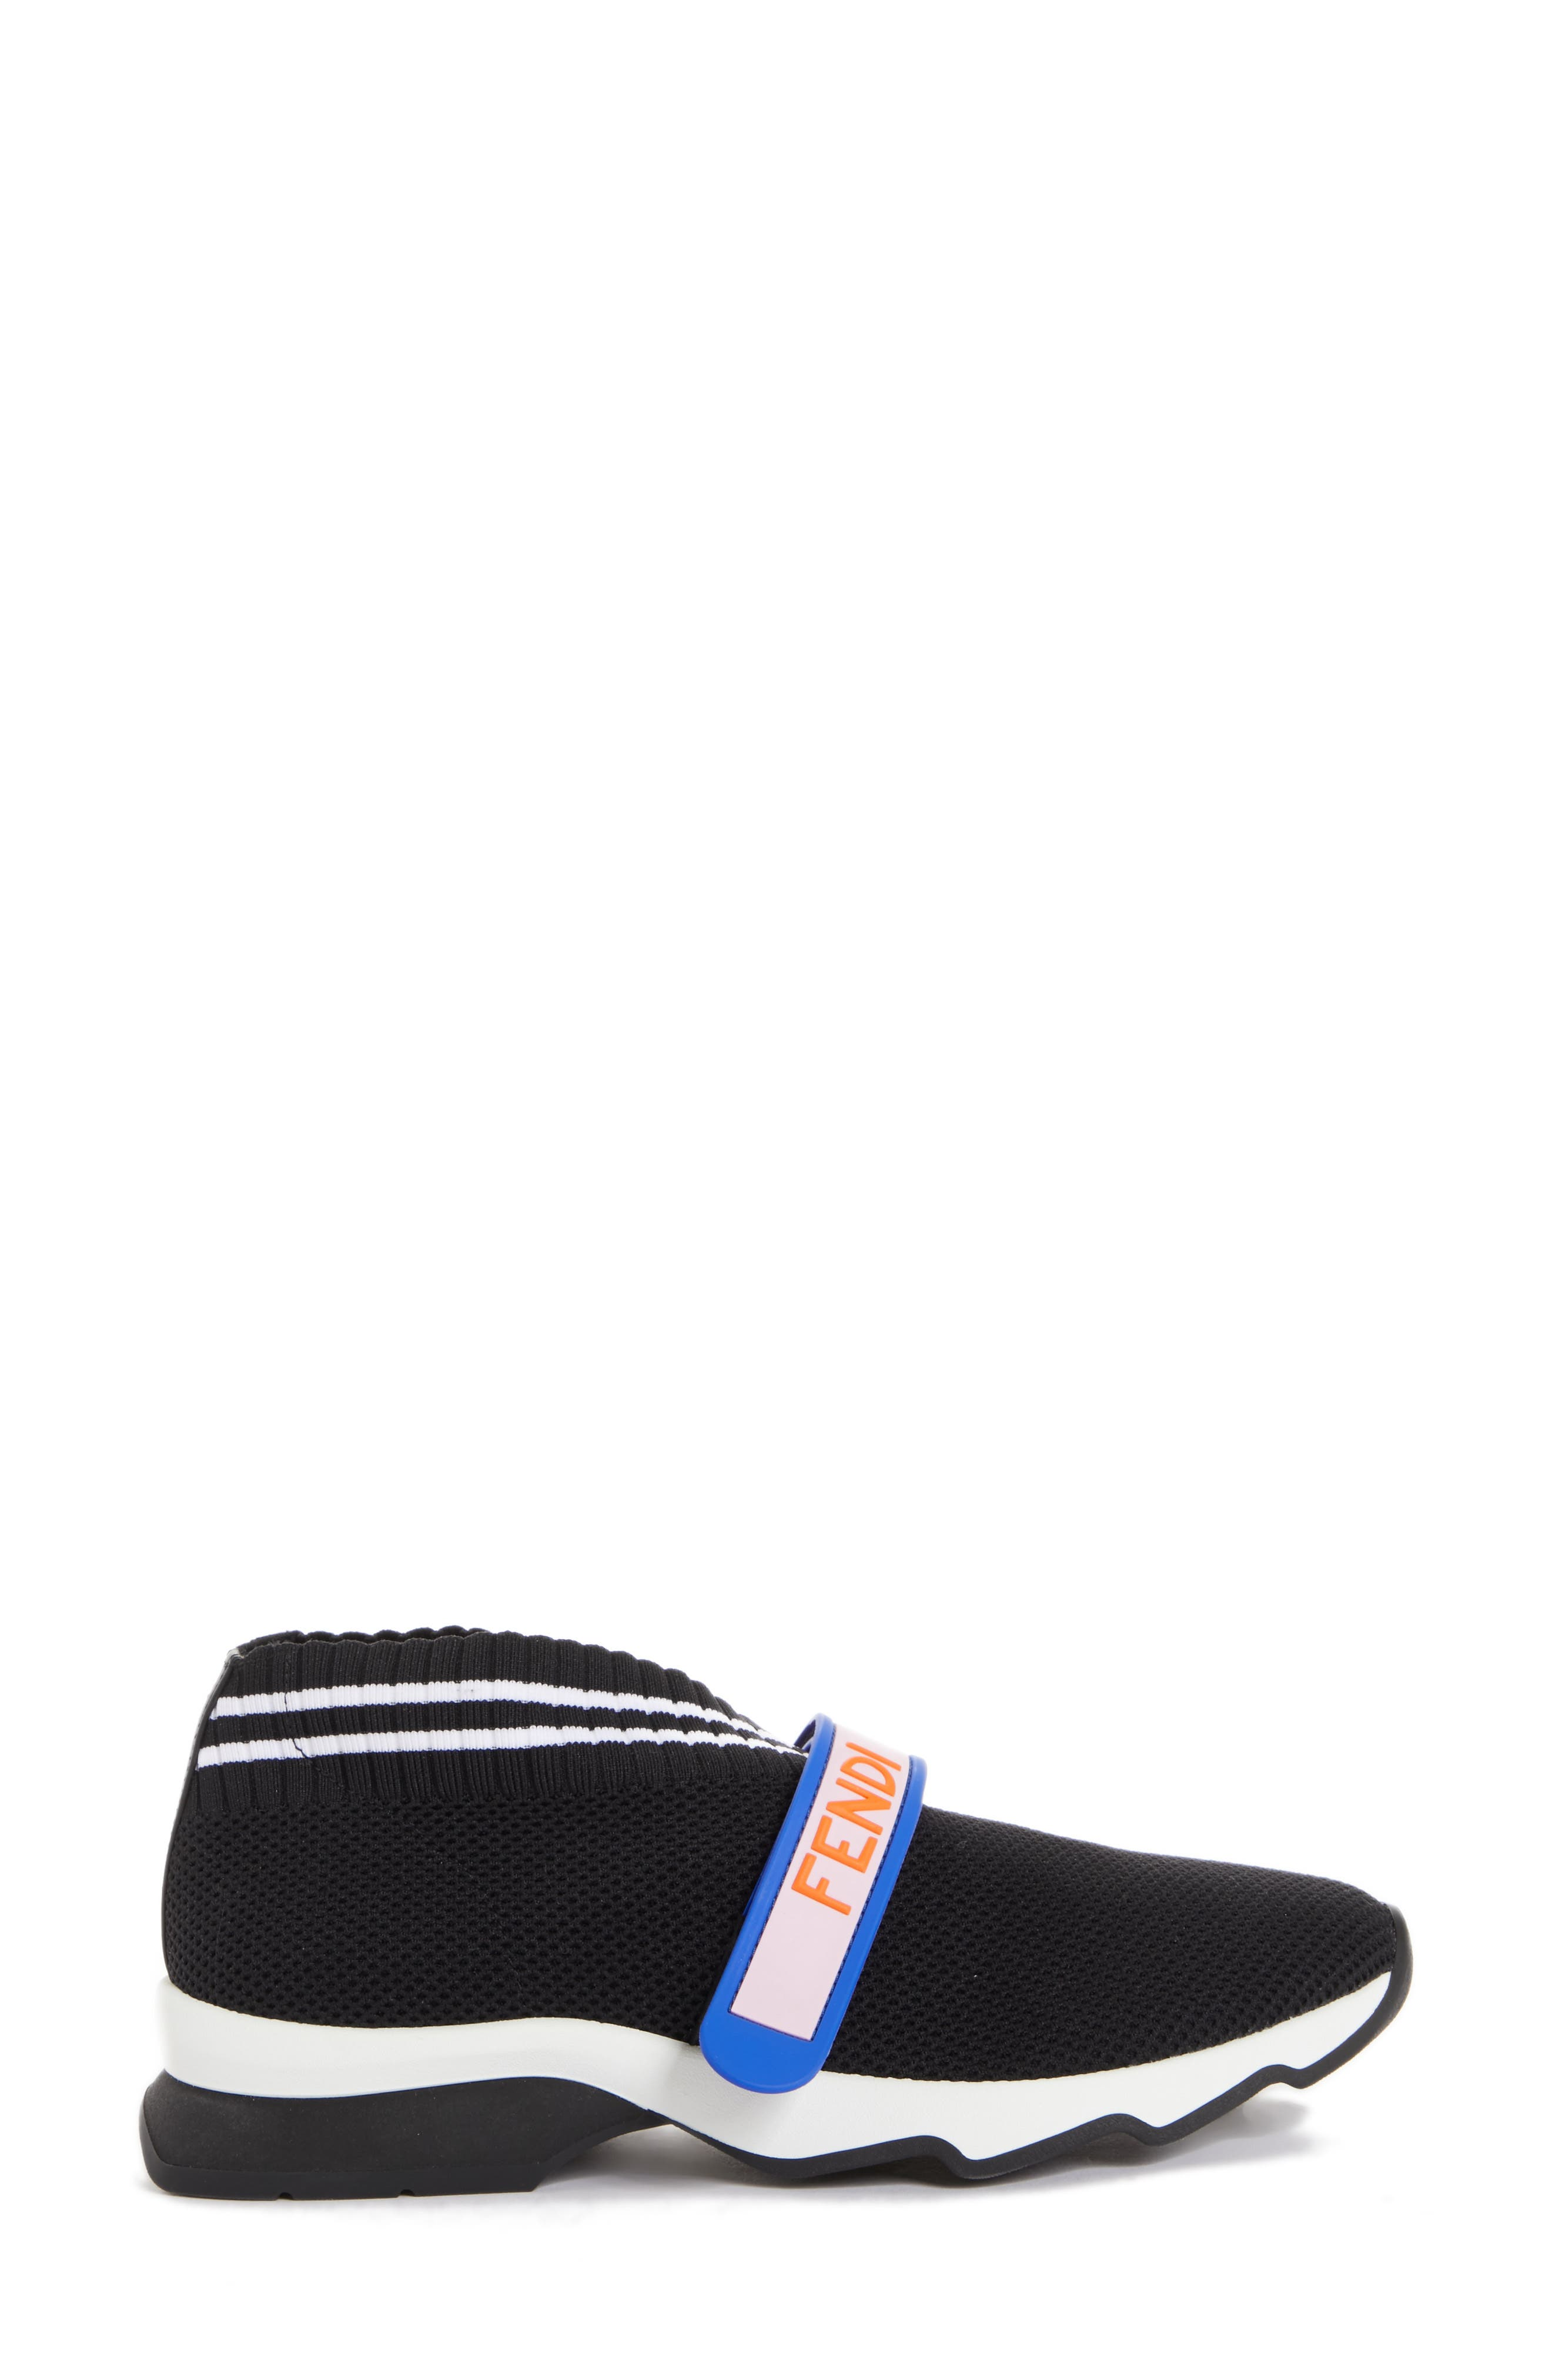 Rockoko Mismatch Sneaker,                             Alternate thumbnail 3, color,                             Black